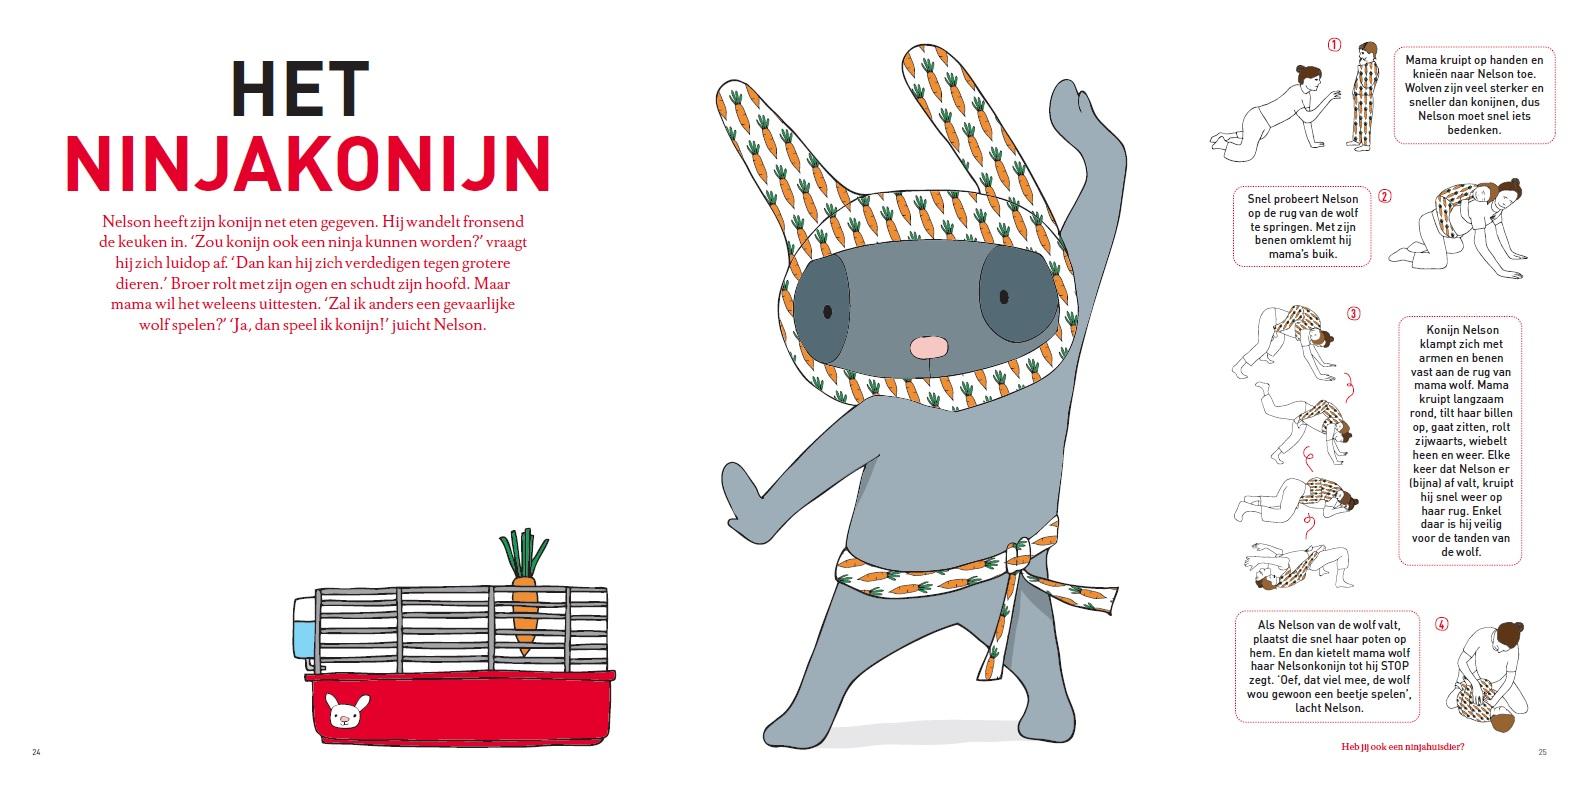 Ninjakonijn